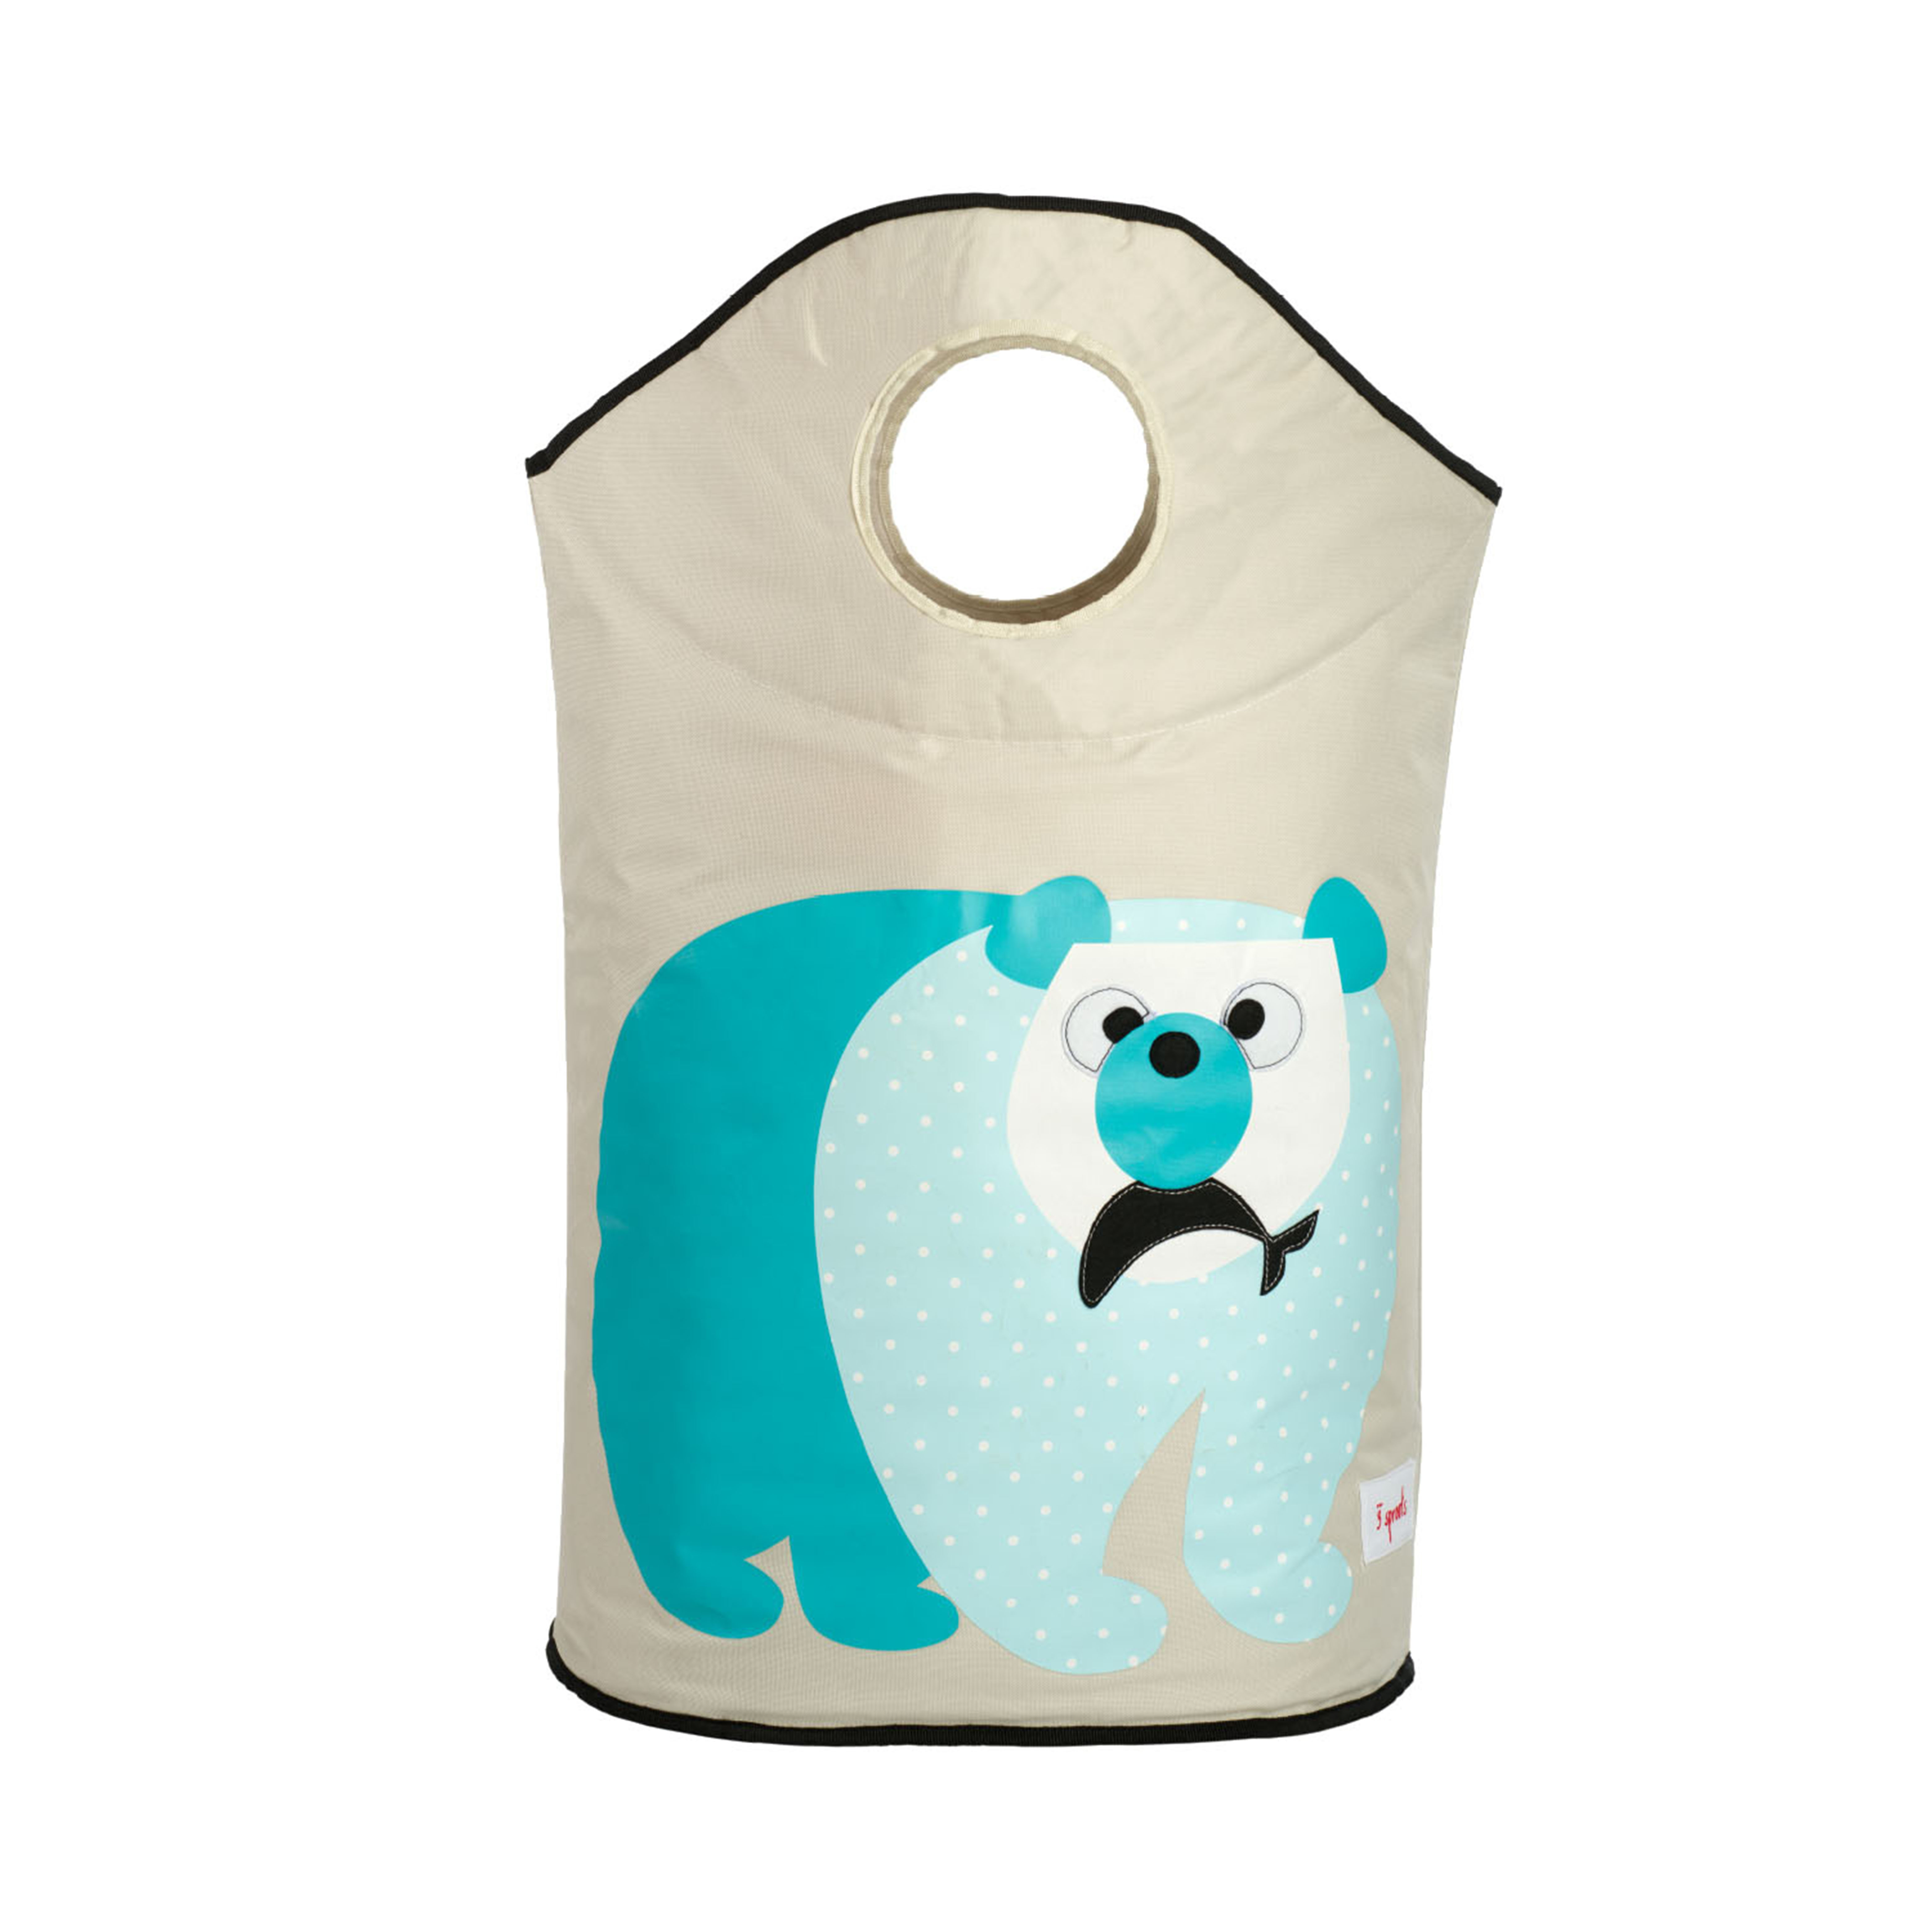 3 Sprouts - Laundry Hamper - Blue Polar Bear